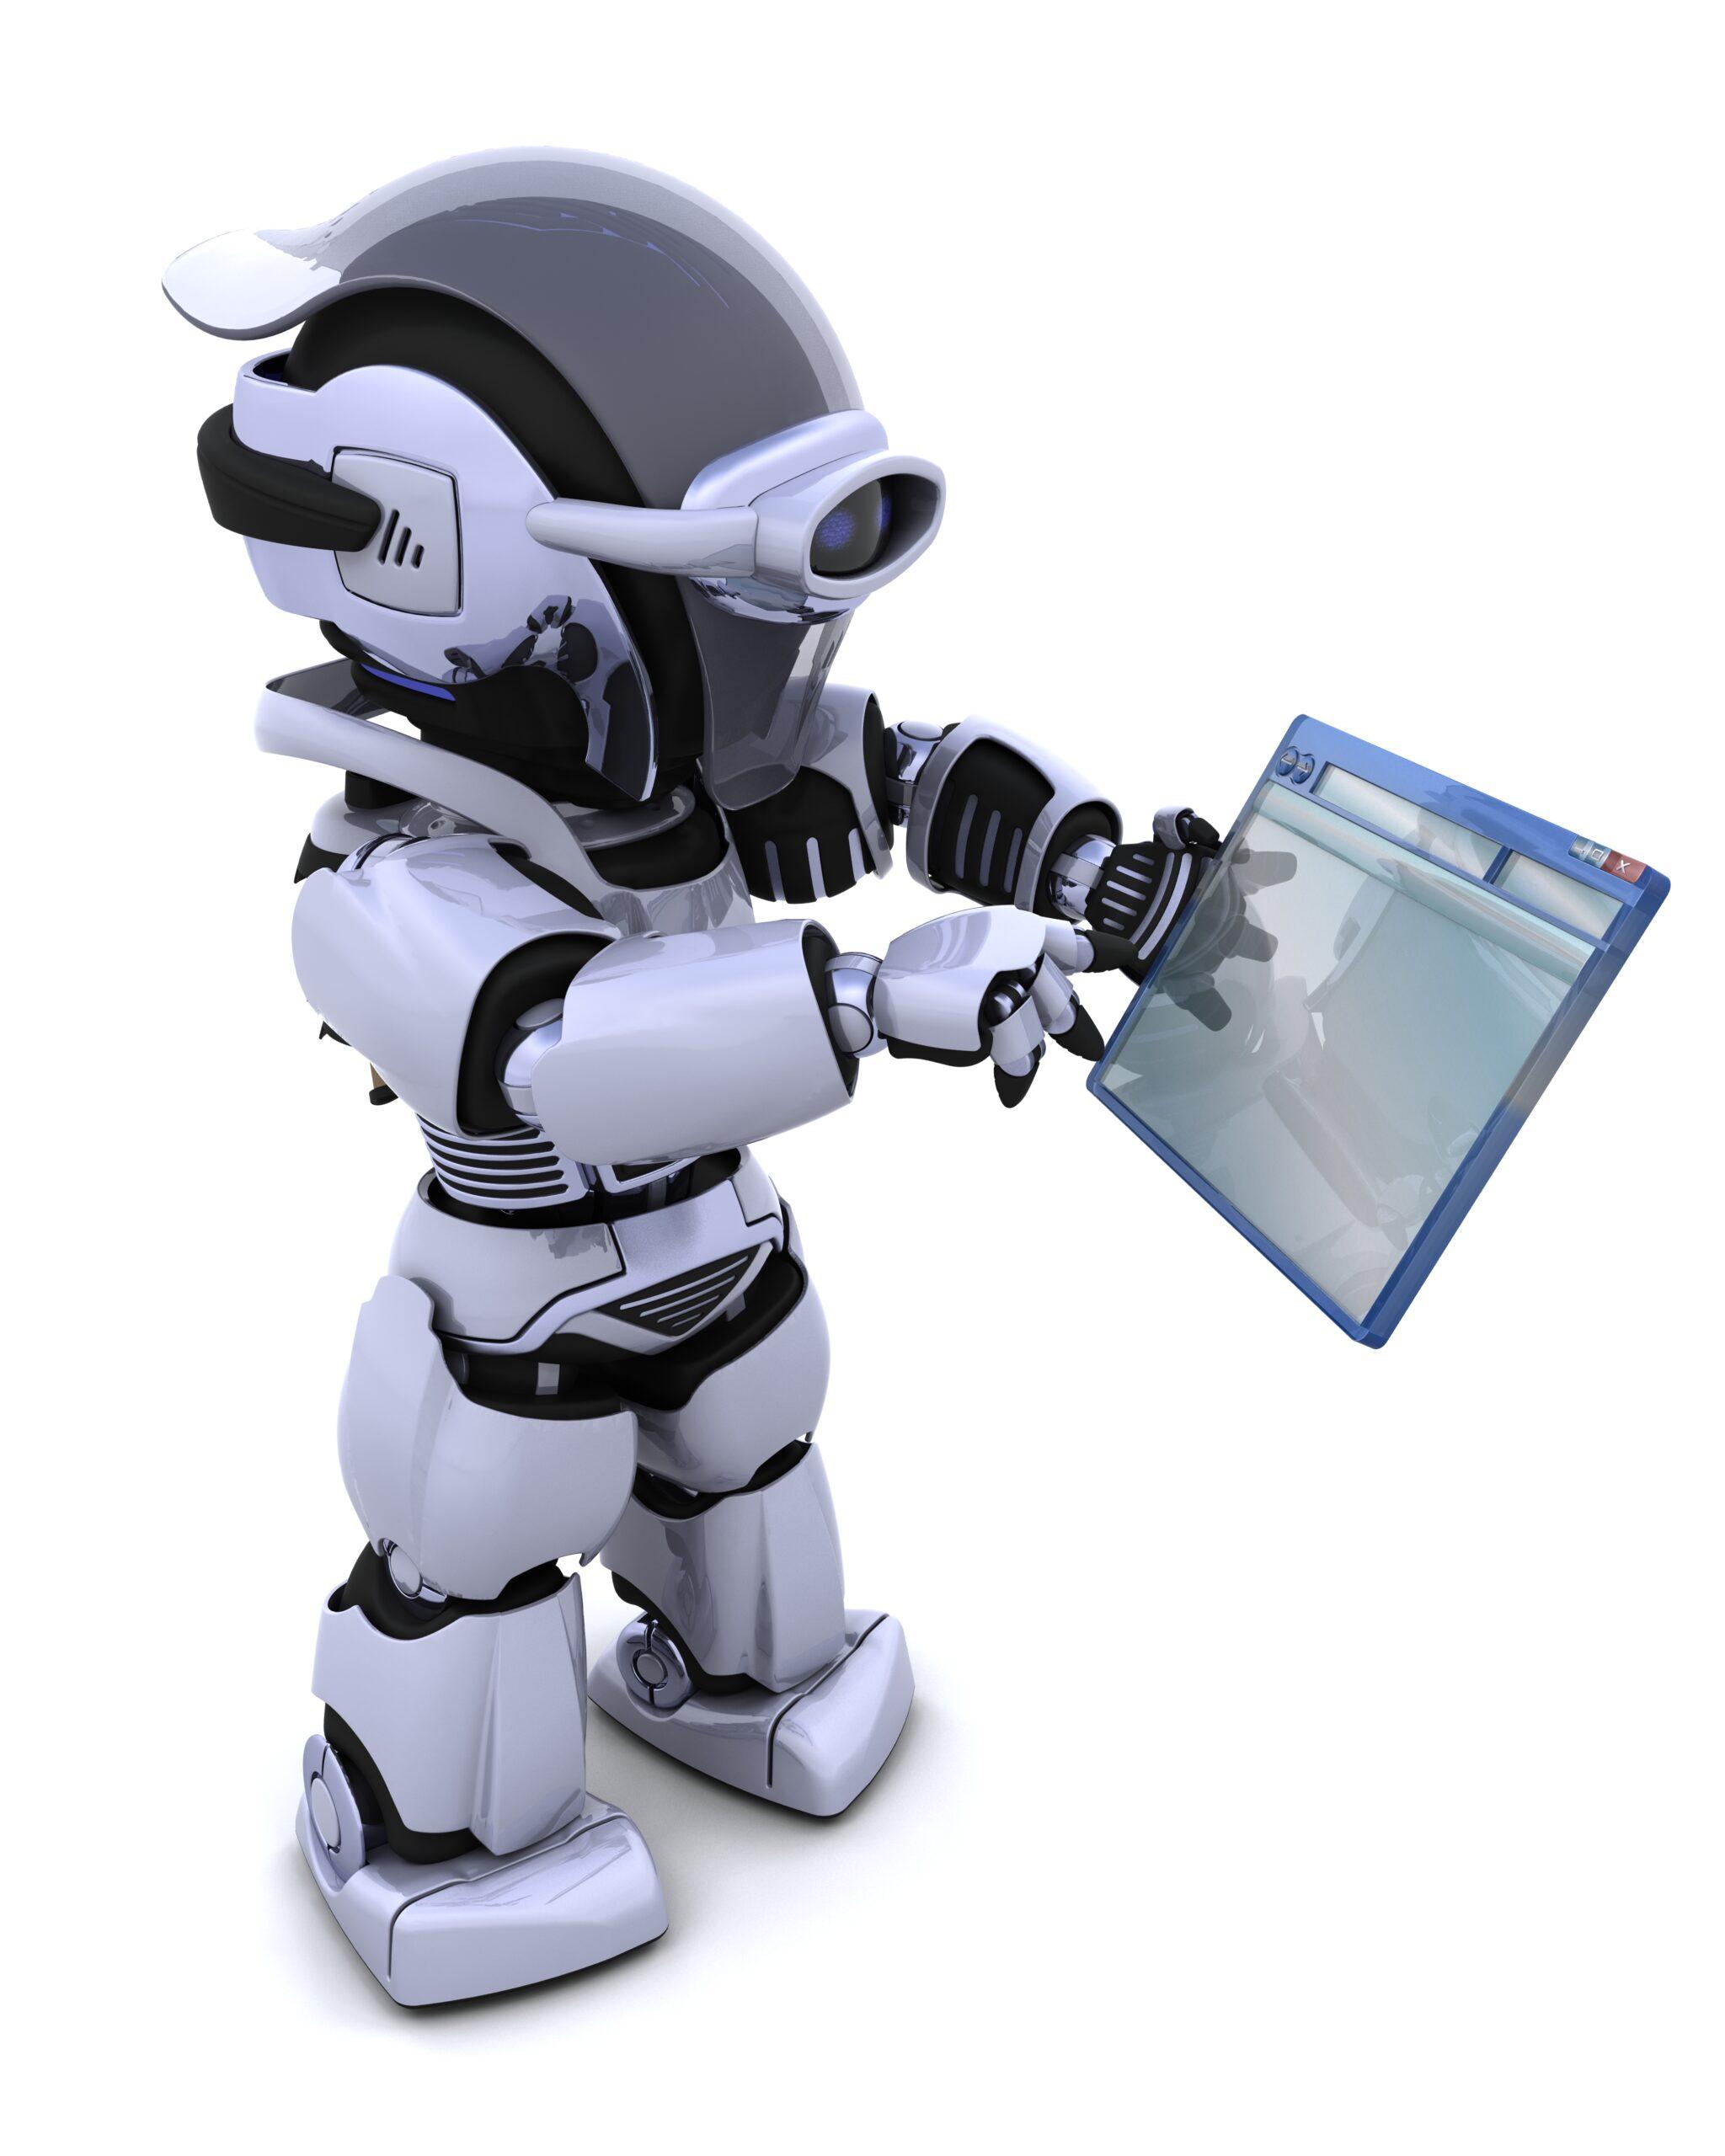 3D render of robot navigating through computer window